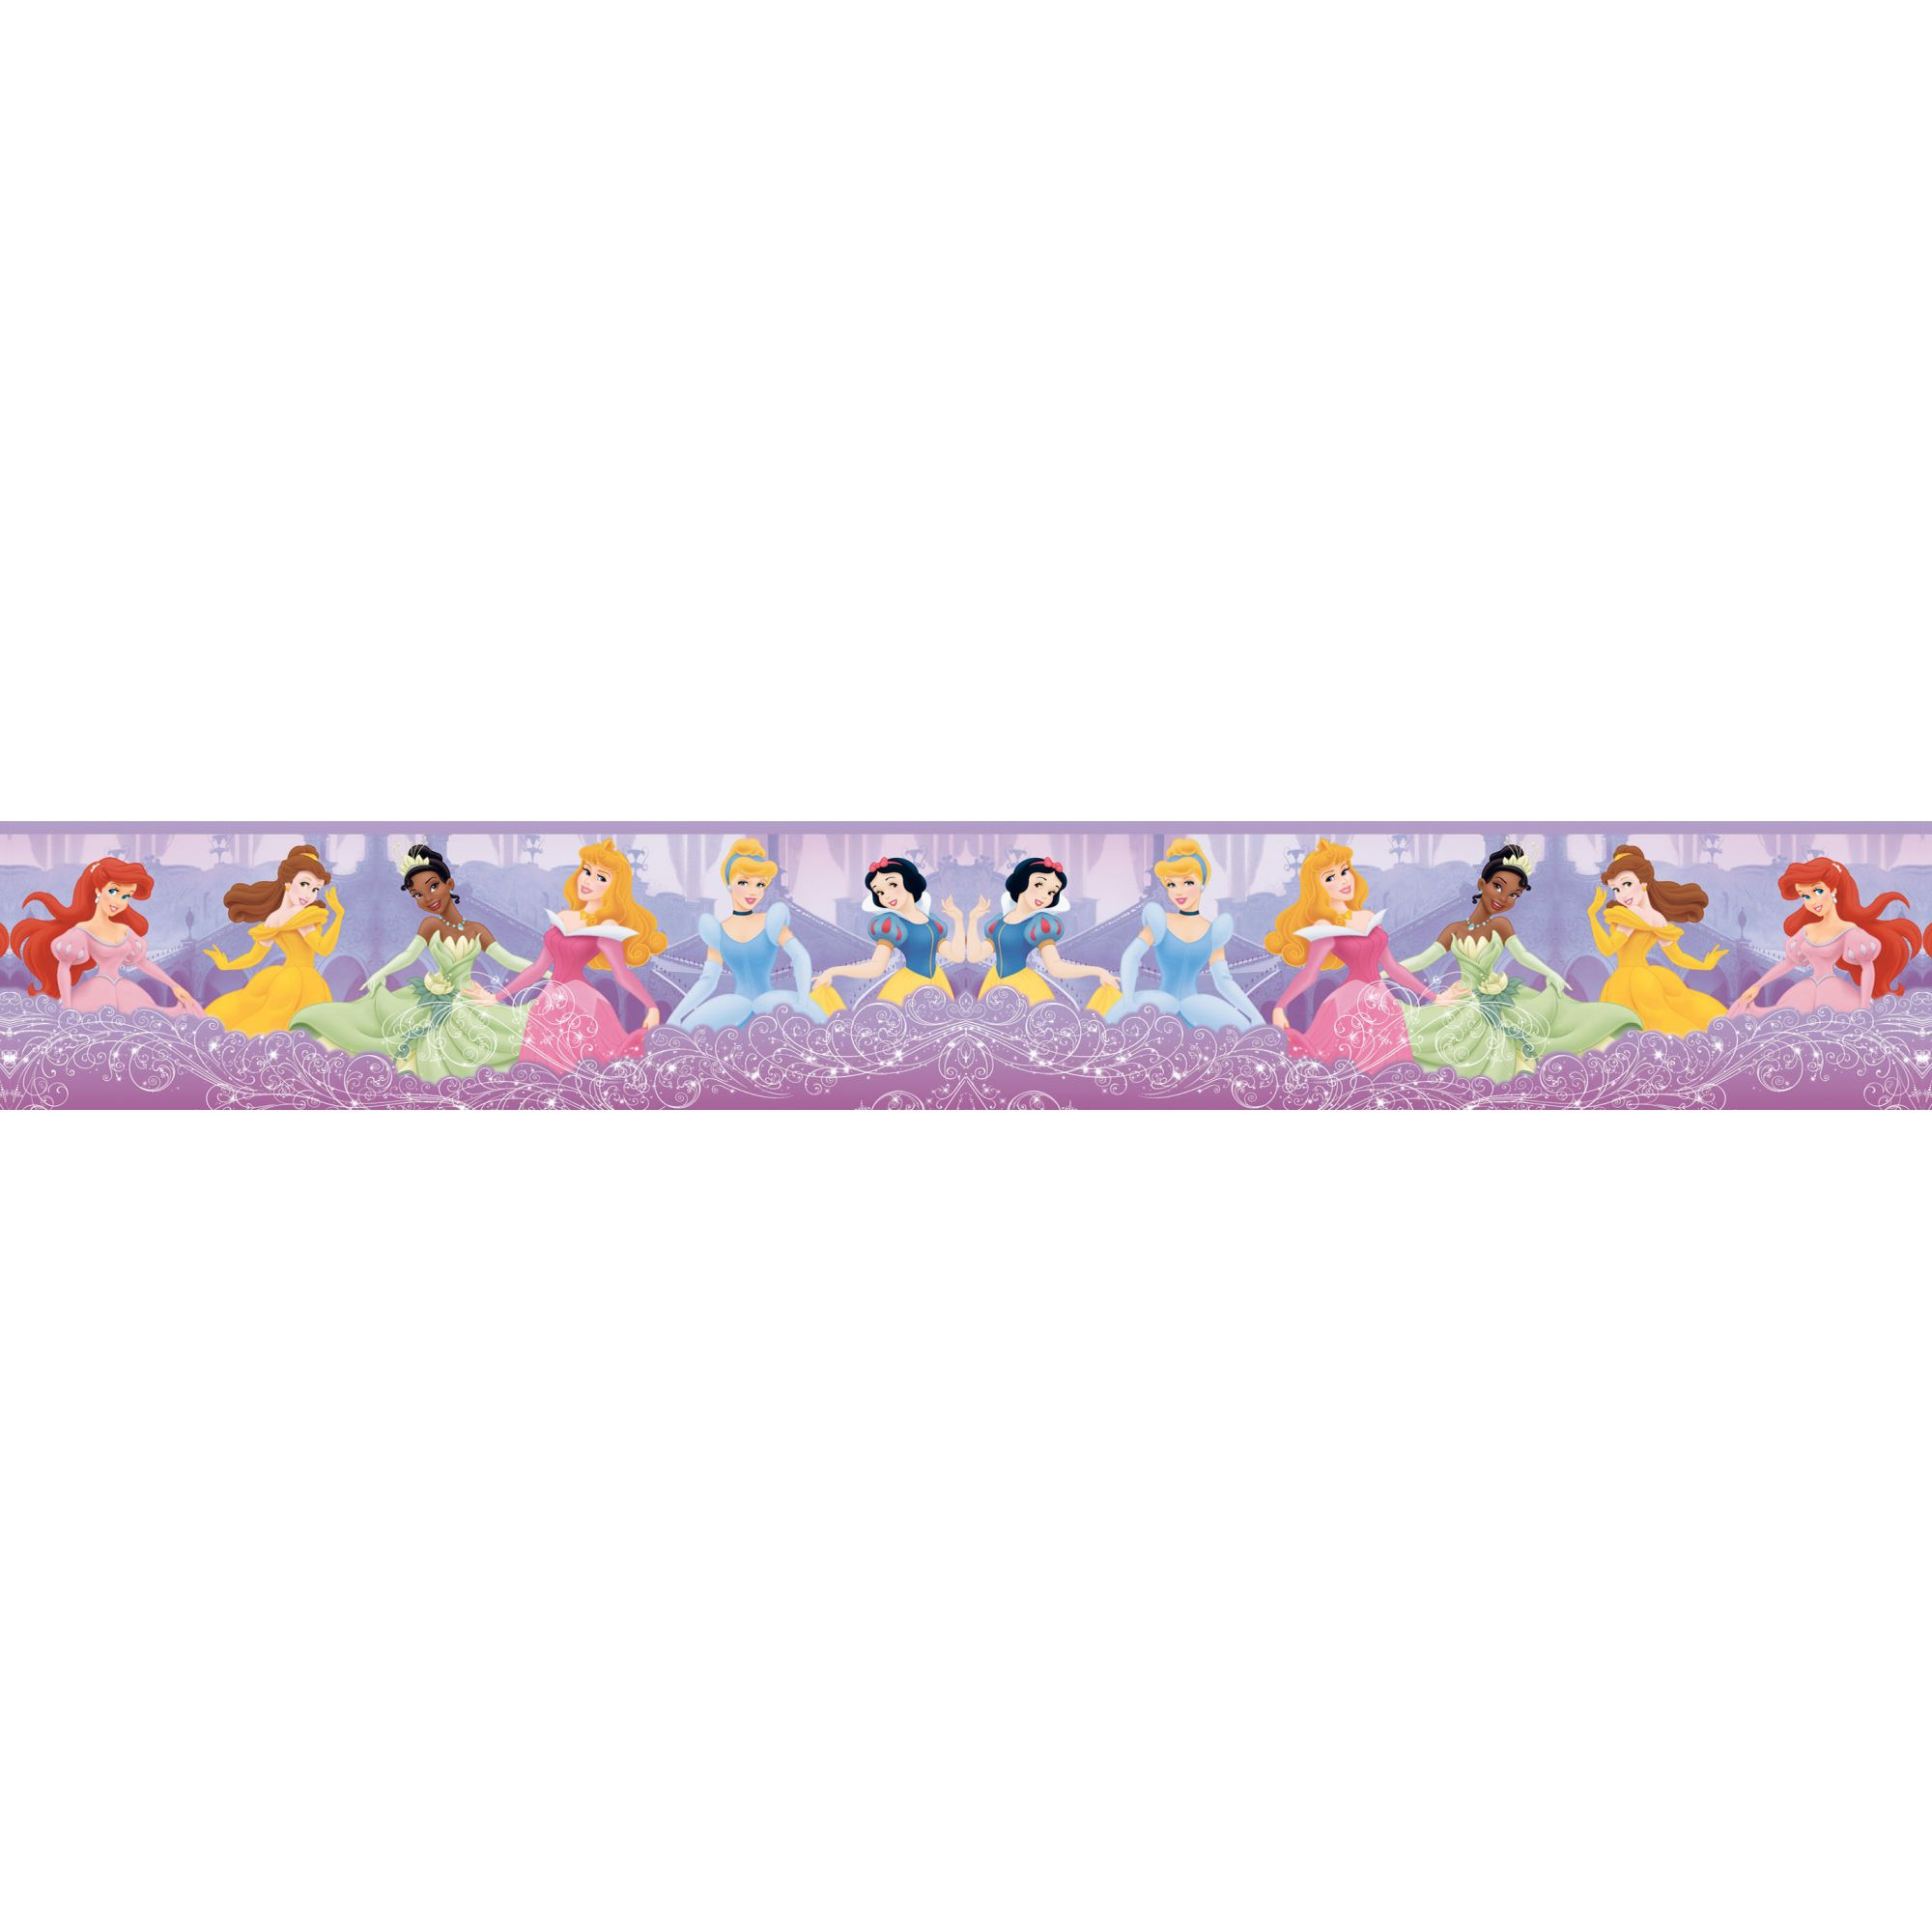 Faixa Decorativa Adesiva Princesas  - Final Decor